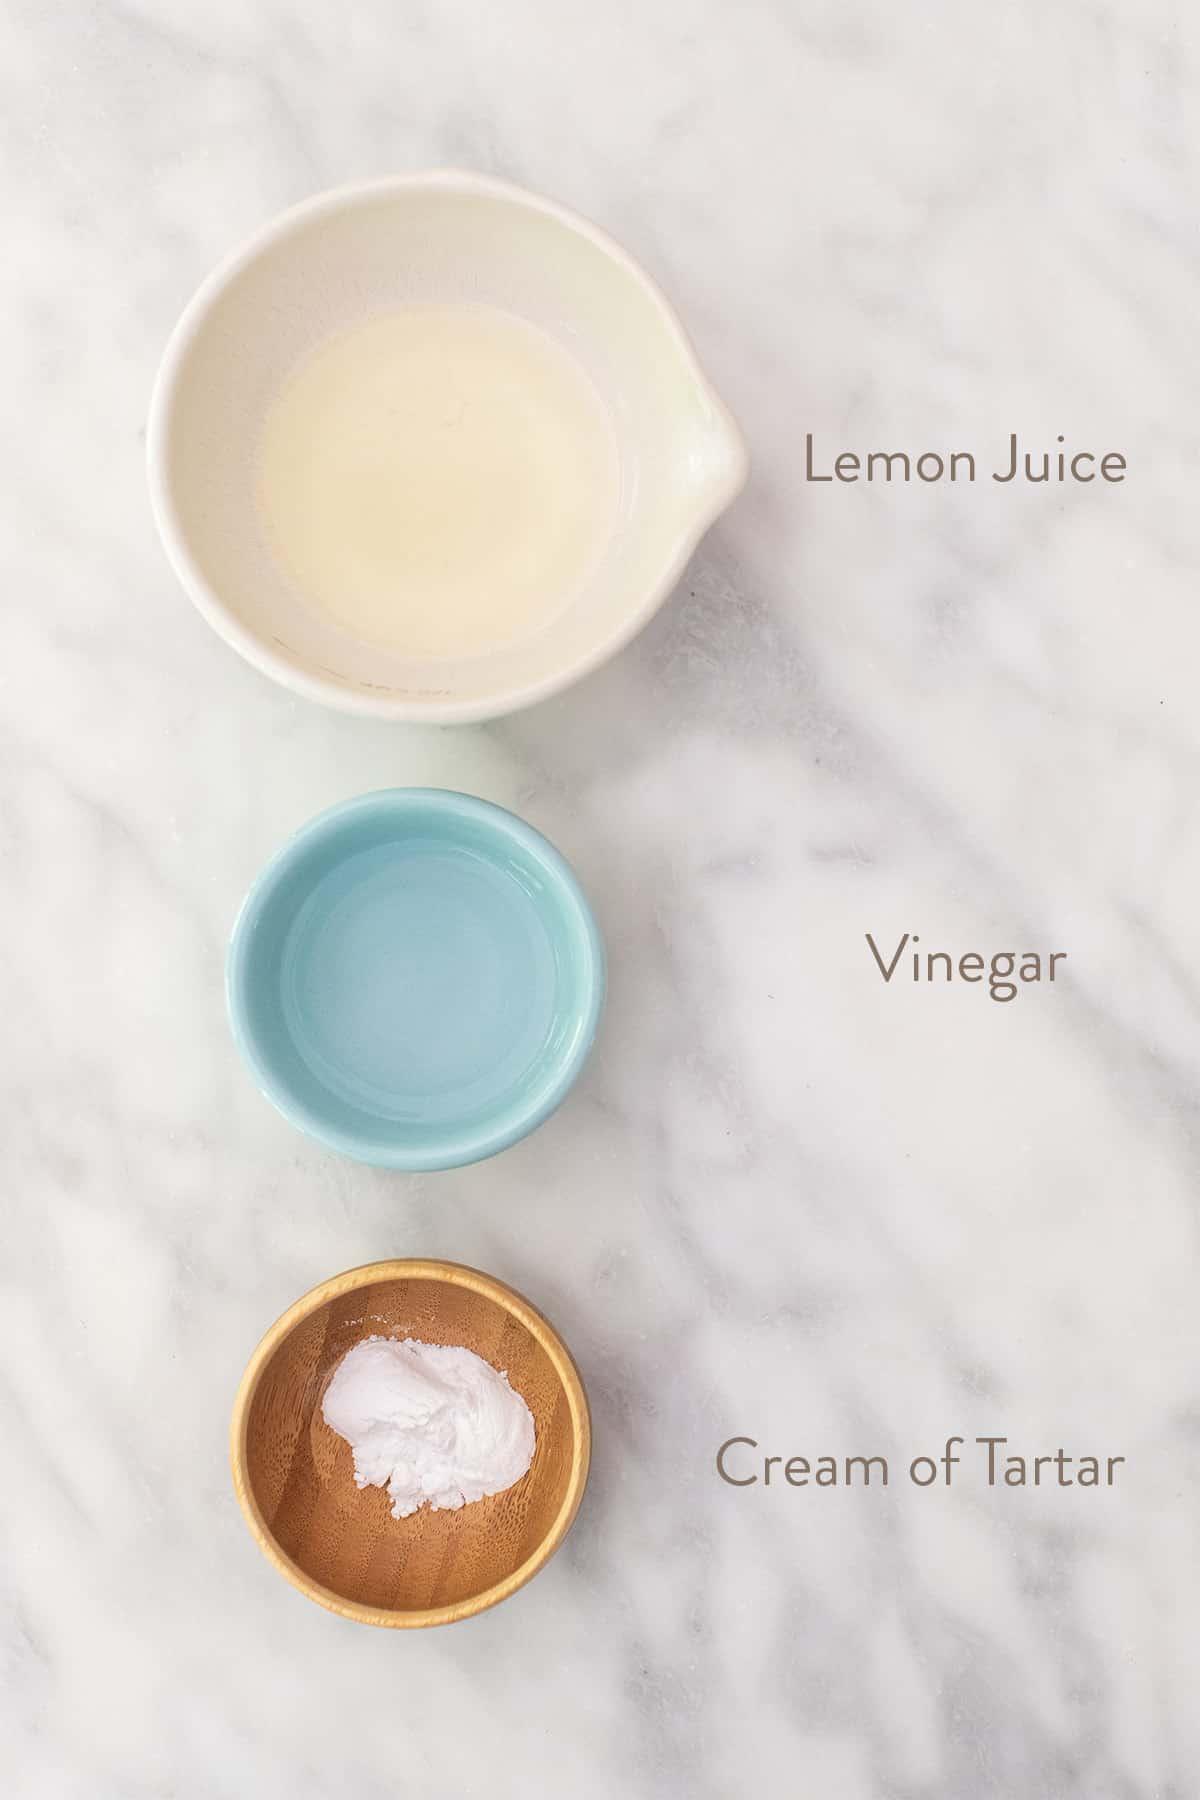 Lemon juice, vinegar and cream of tartar in small bowls.